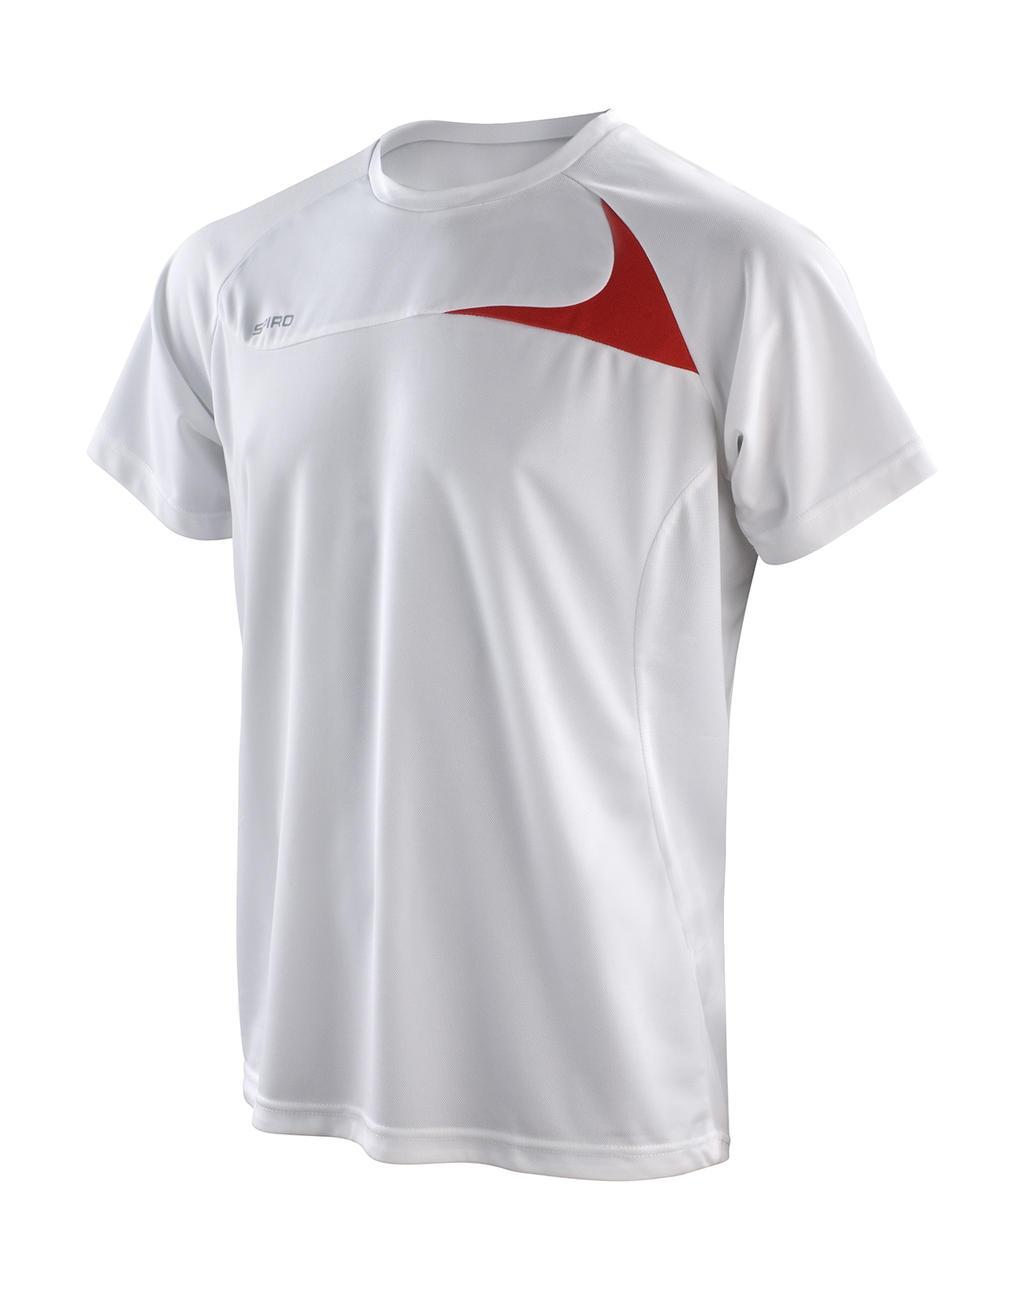 Spiro Men's Dash Training Shirt